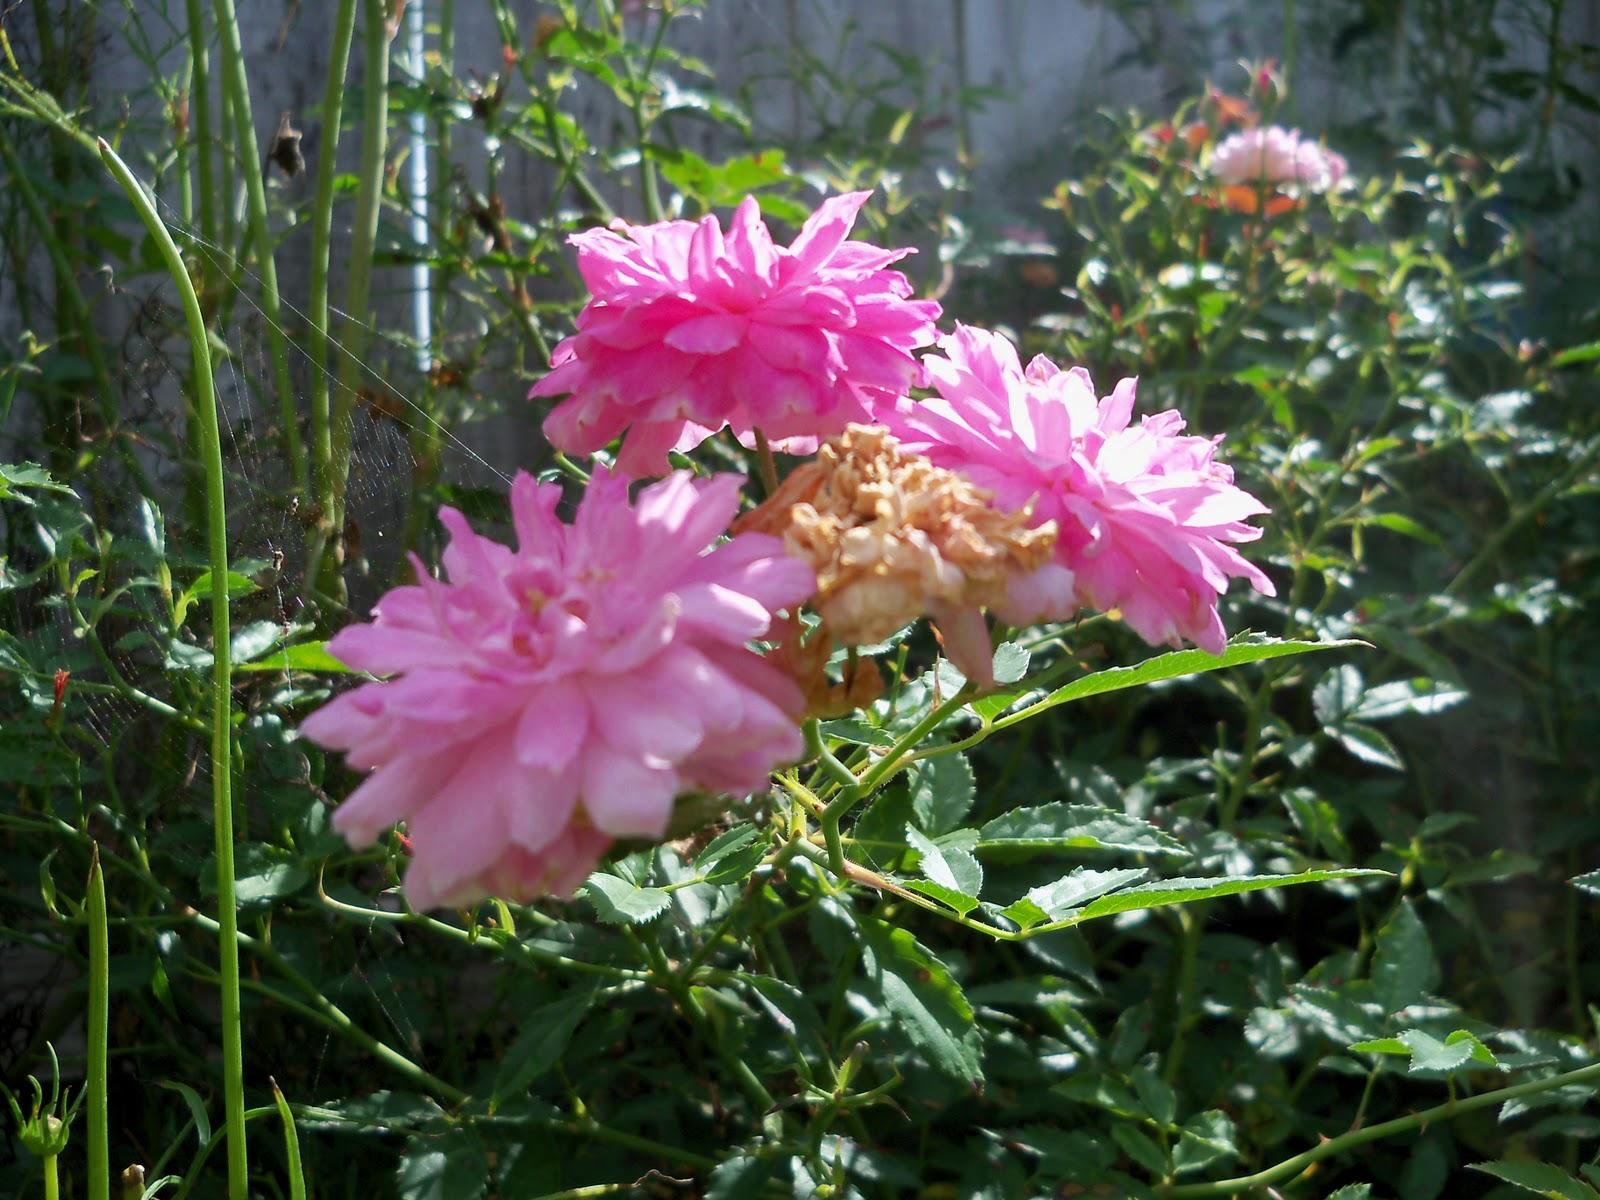 Gardening 2010, Part Three - 101_5003.JPG